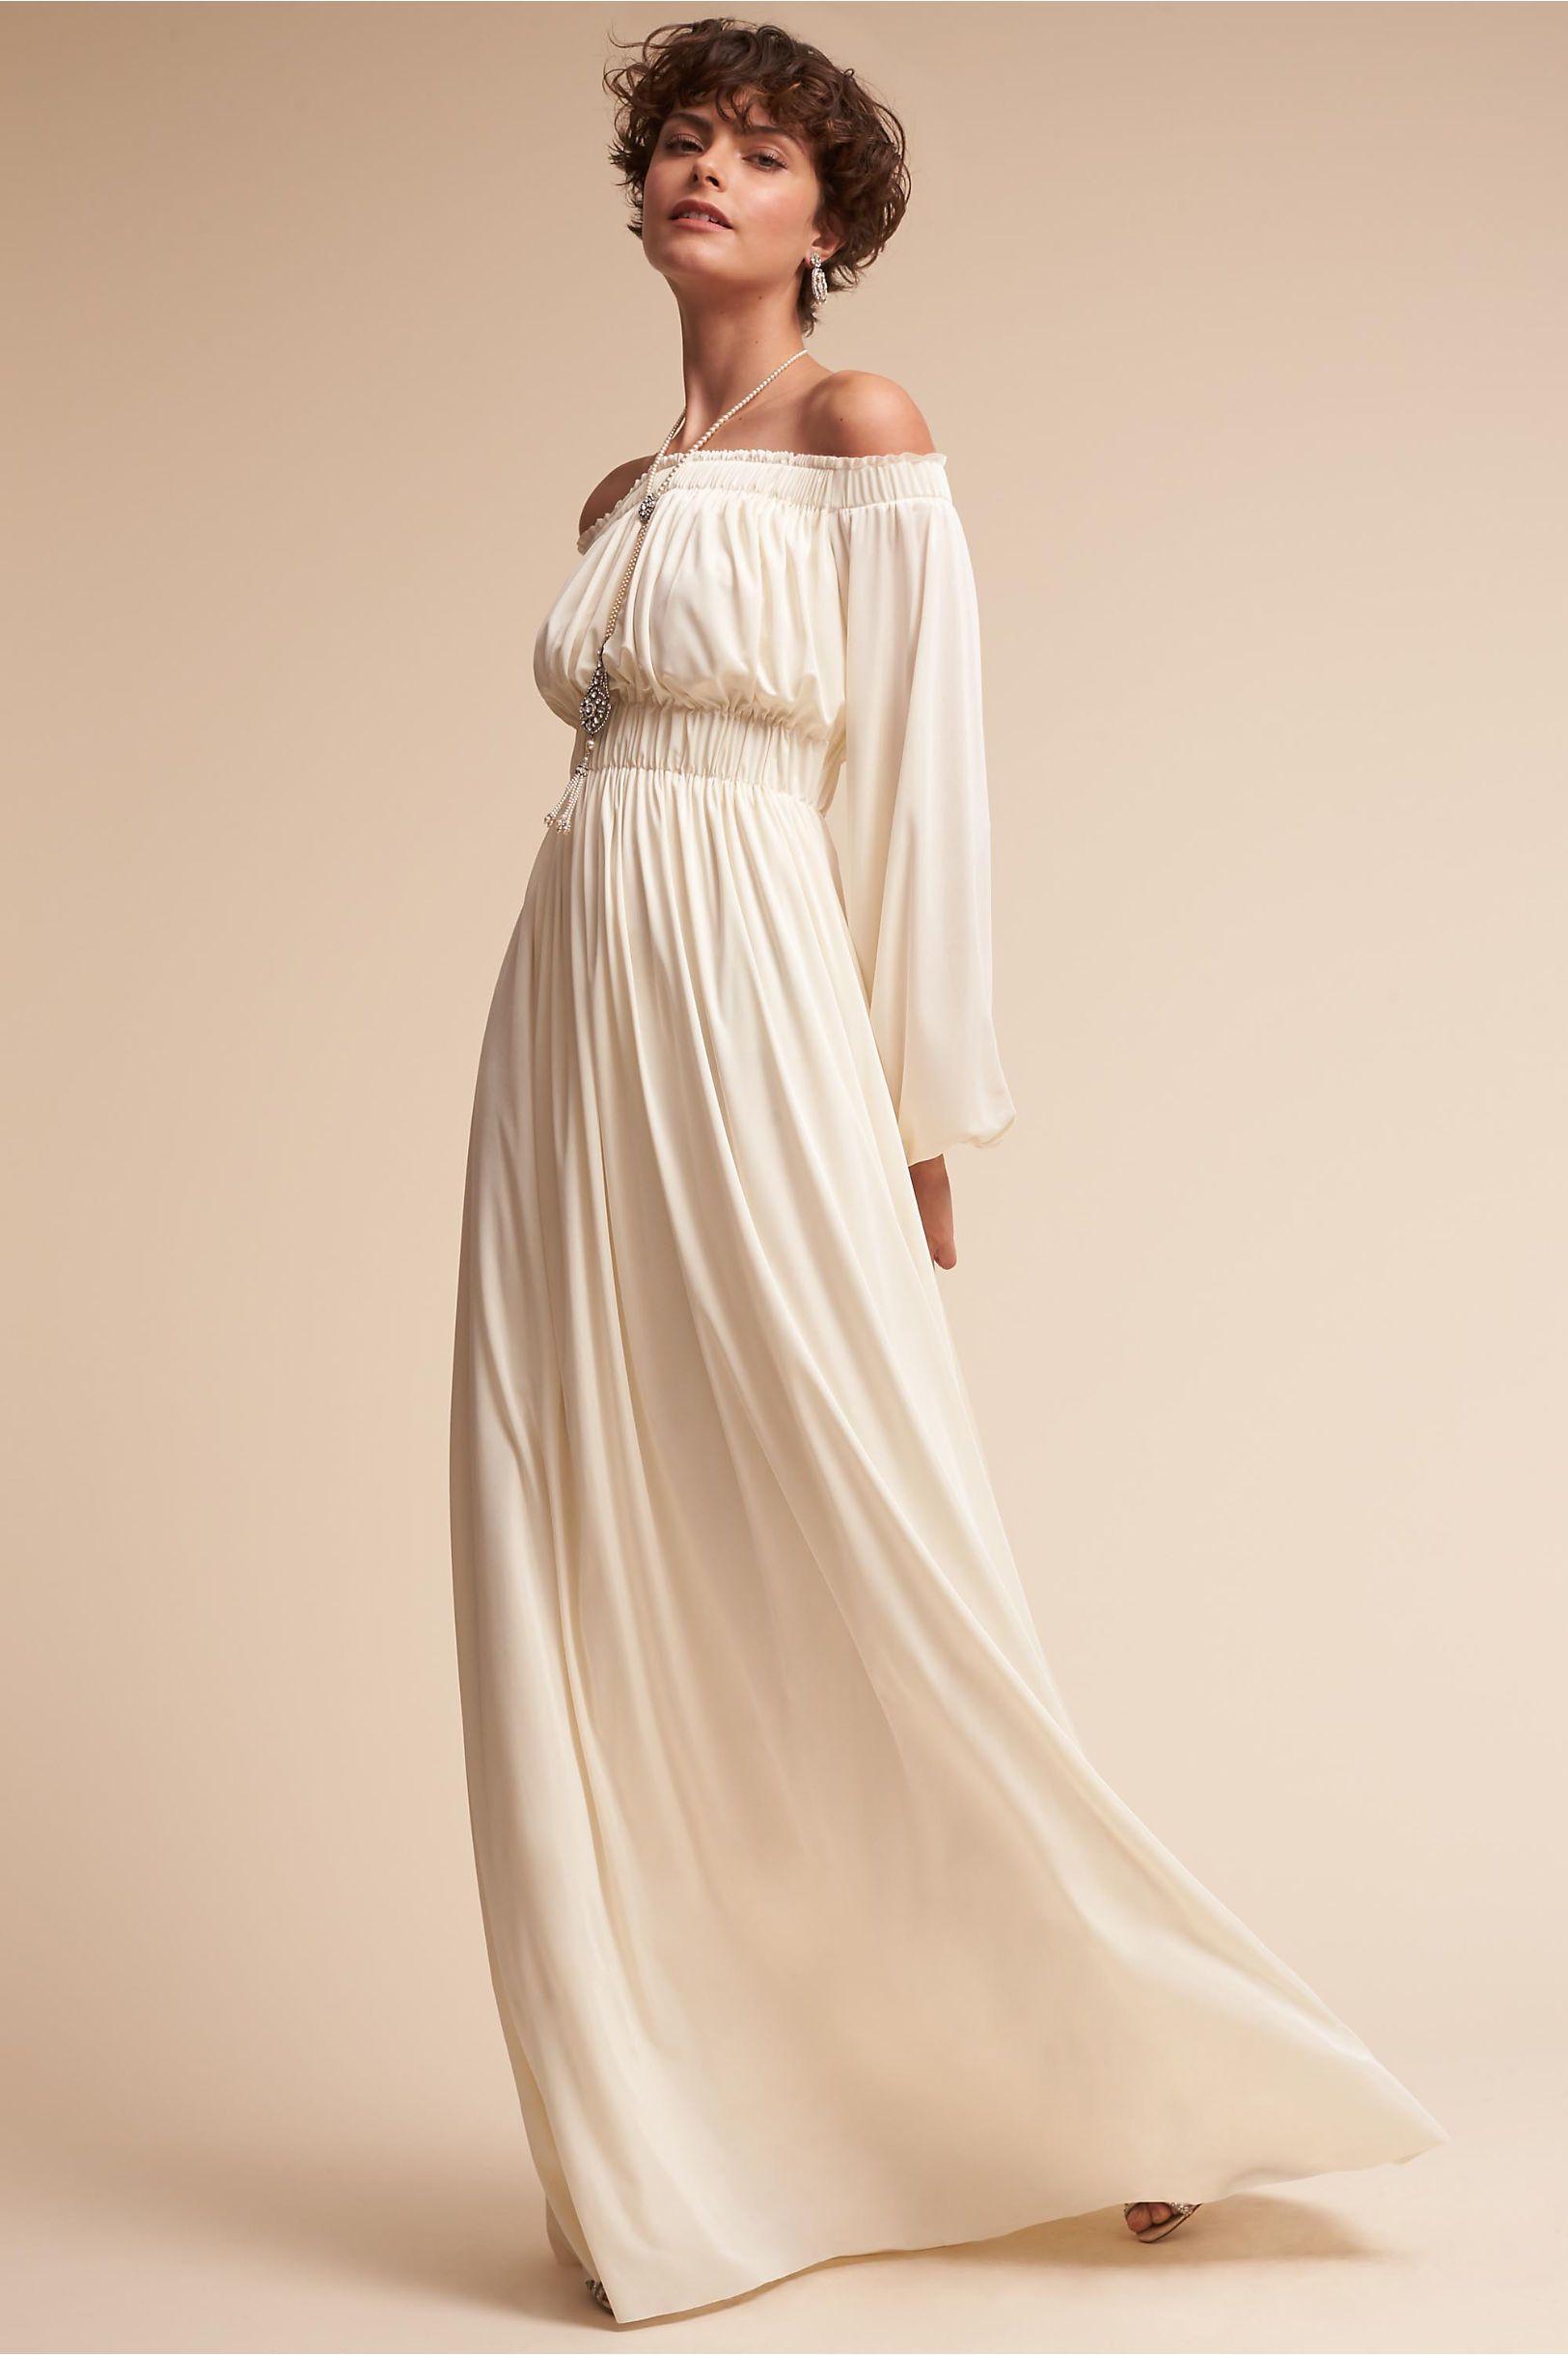 BHLDN\'s Catherine Deane Miranda Gown in Cream | Beach Wedding ...